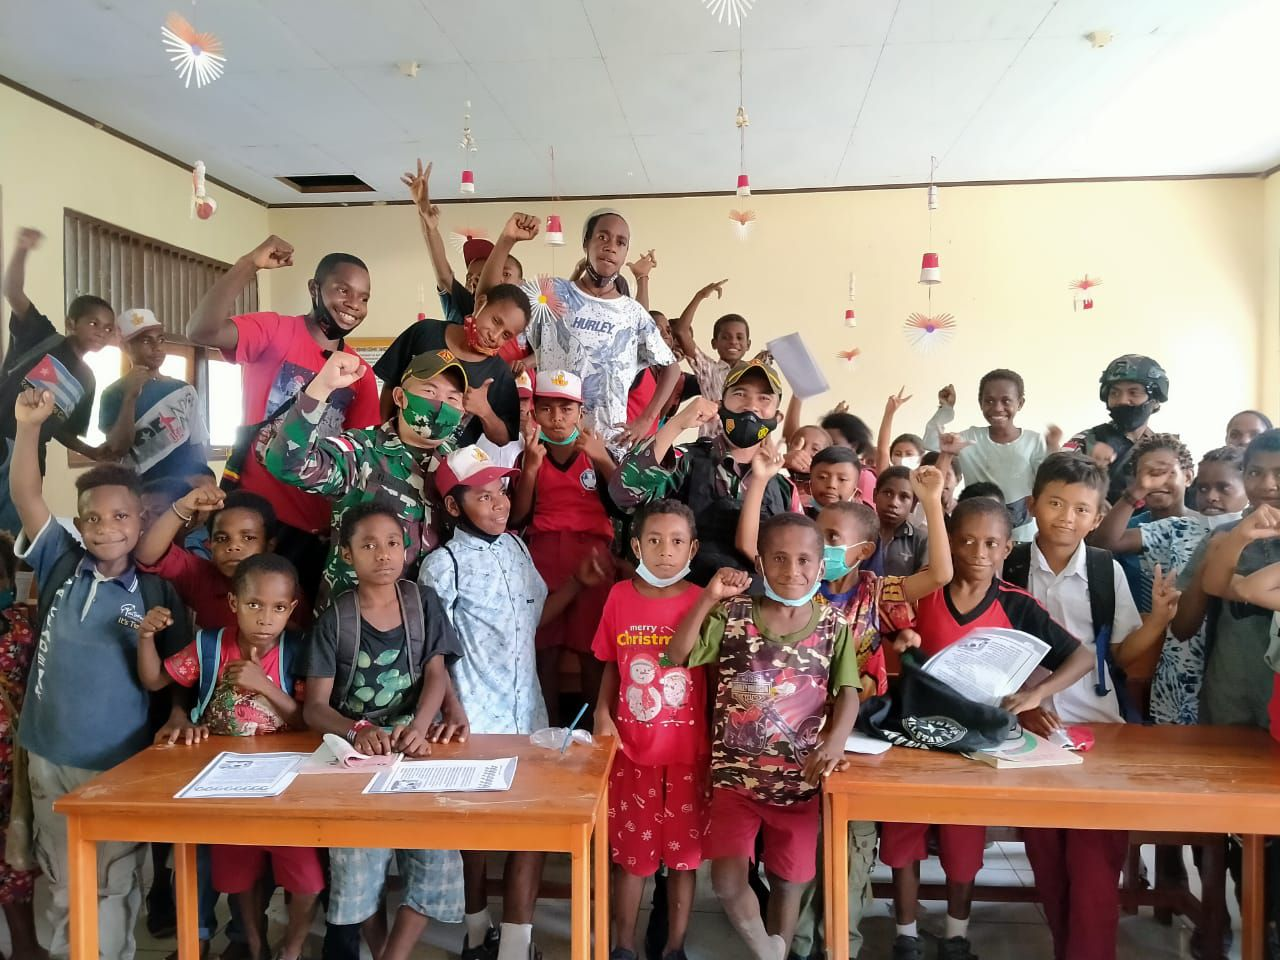 Satgas Pamtas Hibur Anak-Anak Papua Dengan Atraksi Sulap